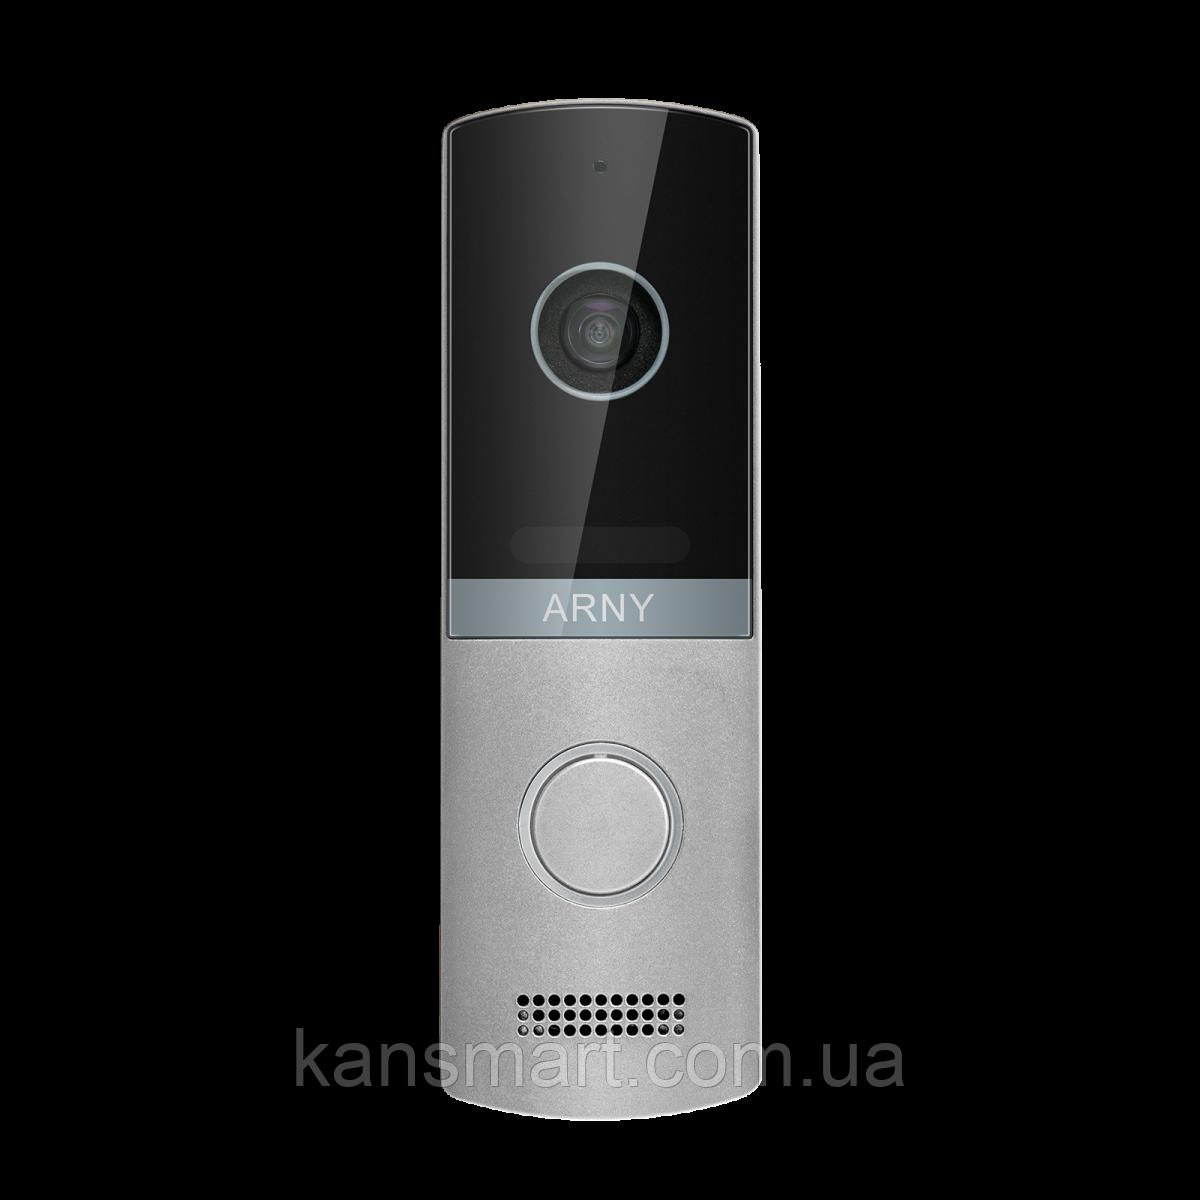 Видеопанель ARNY AVP-NG230 1MPX silver